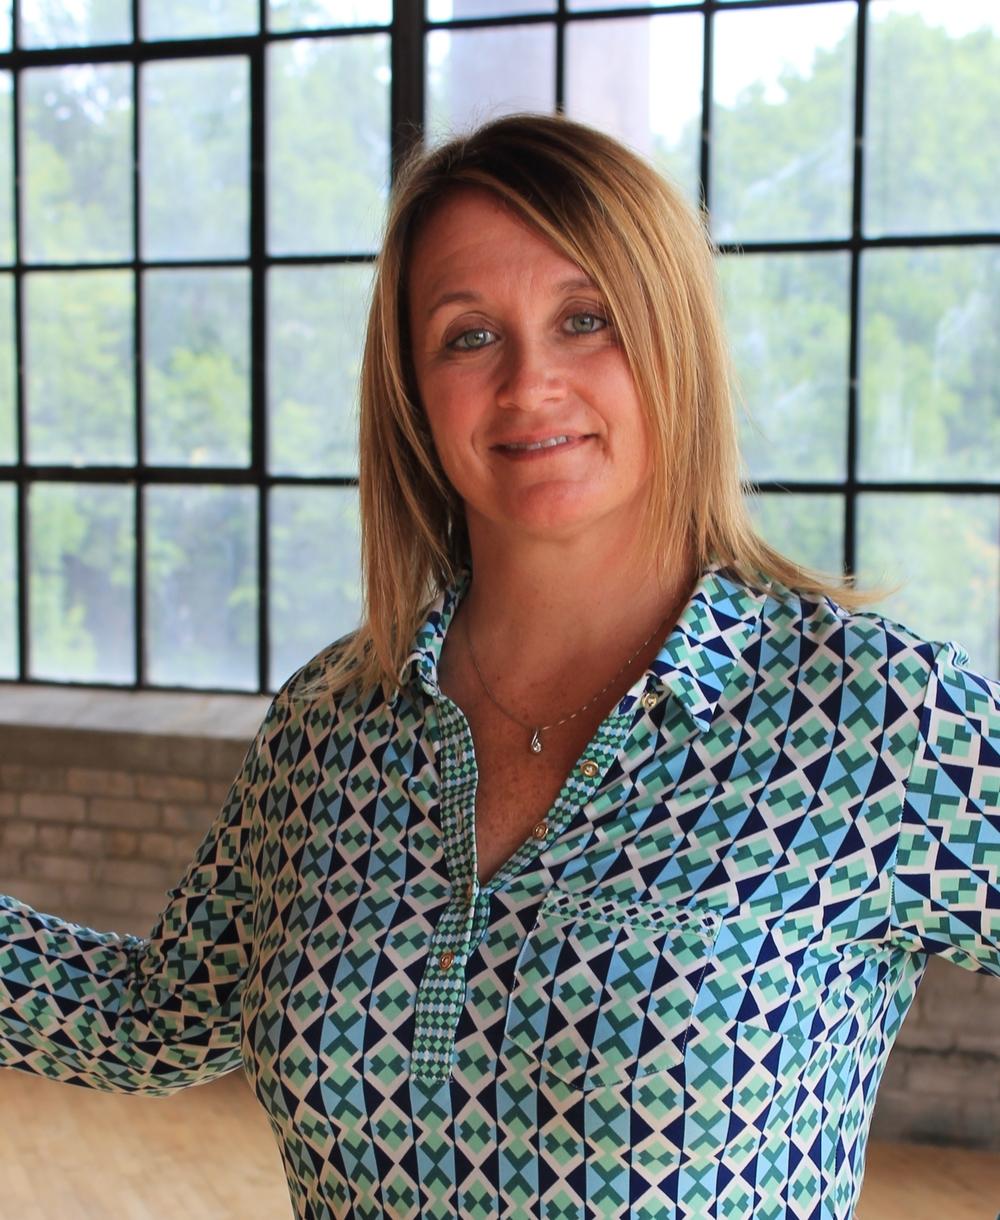 Michelle Fritsche - Director of Training